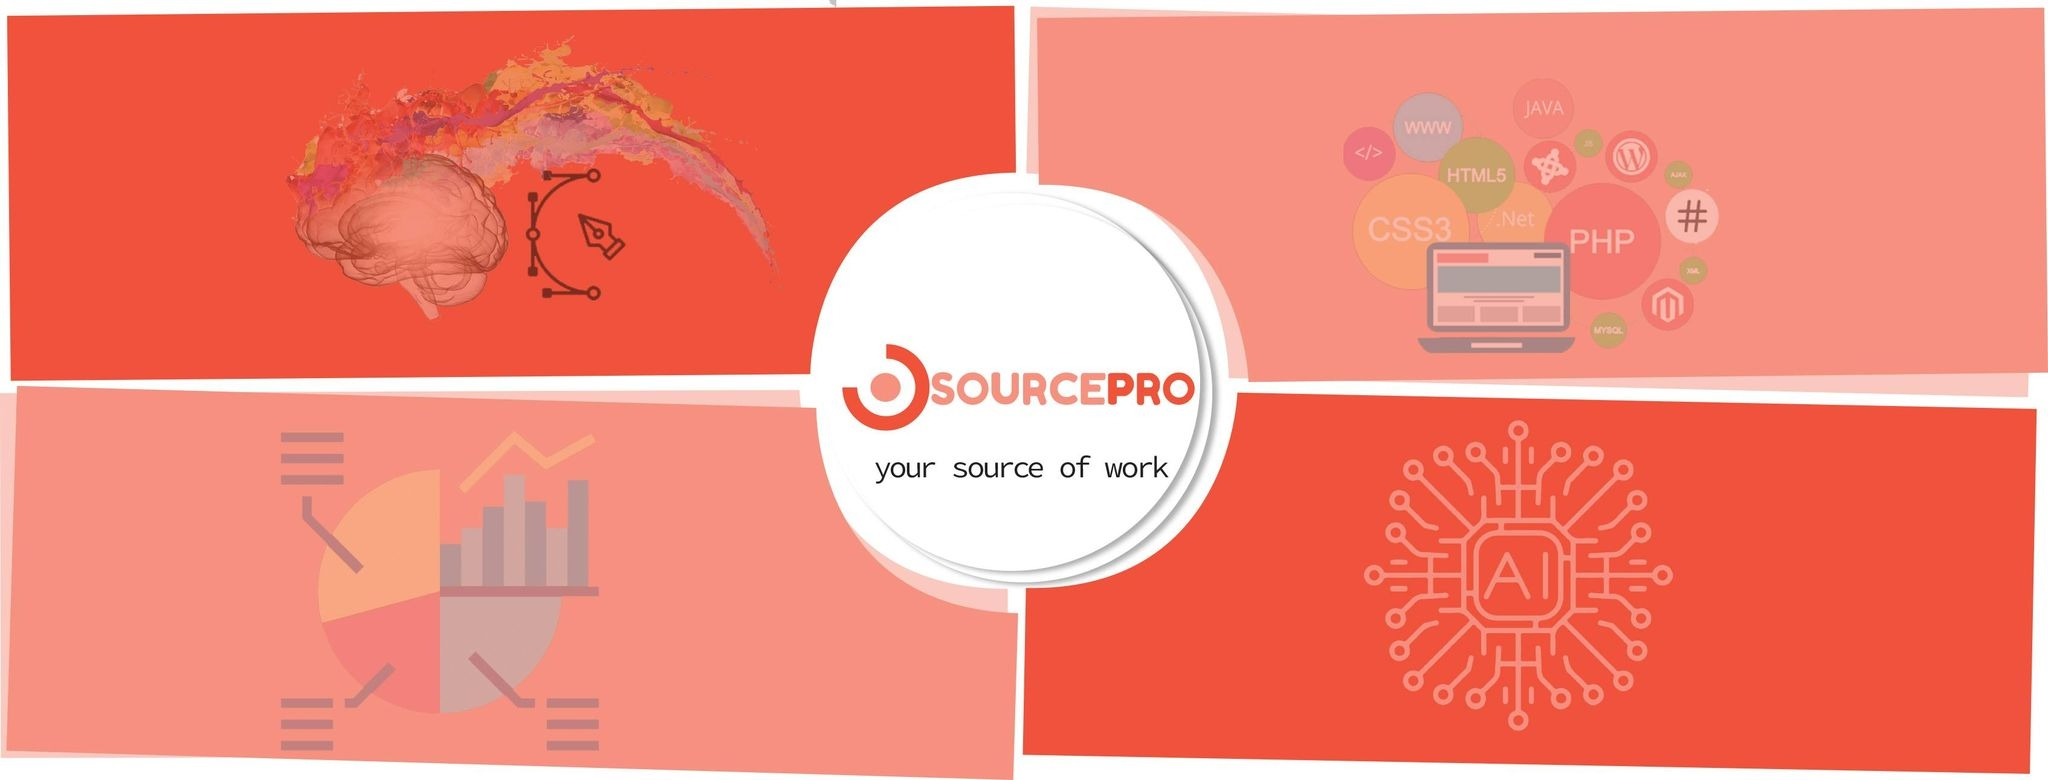 SourcePro (@sourcepro) Cover Image